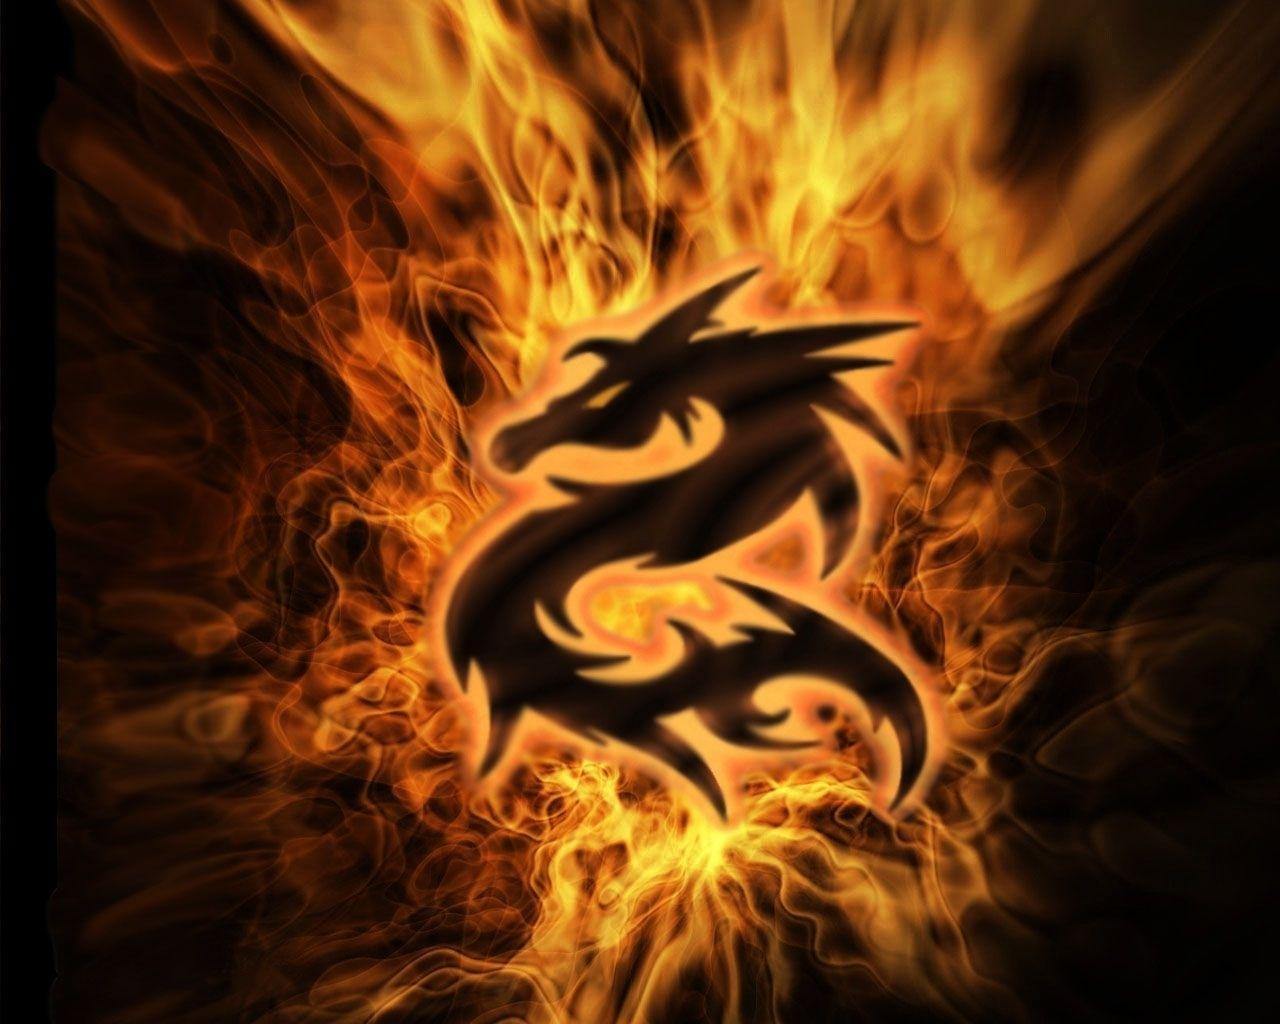 free 3d desktop wallpaper screensavers |  fire 3d pictures